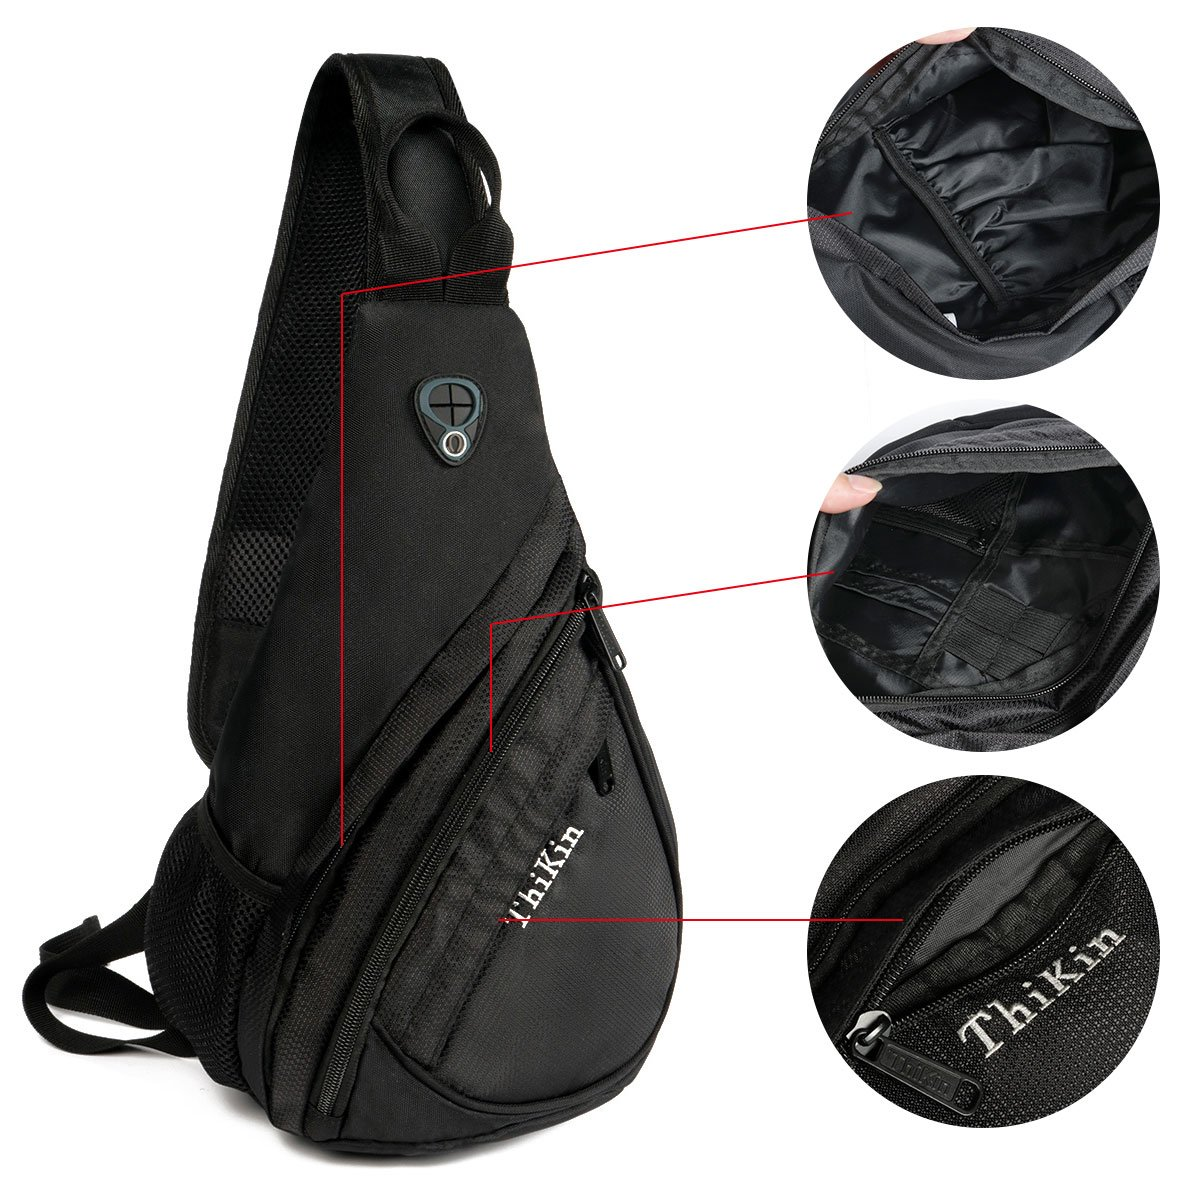 70b33b8bad75 Amazon.com   Sport Nylon Sling Bag Shoulder Back Packs Grey Cross Body  Chest Bags for Men   Sports   Outdoors